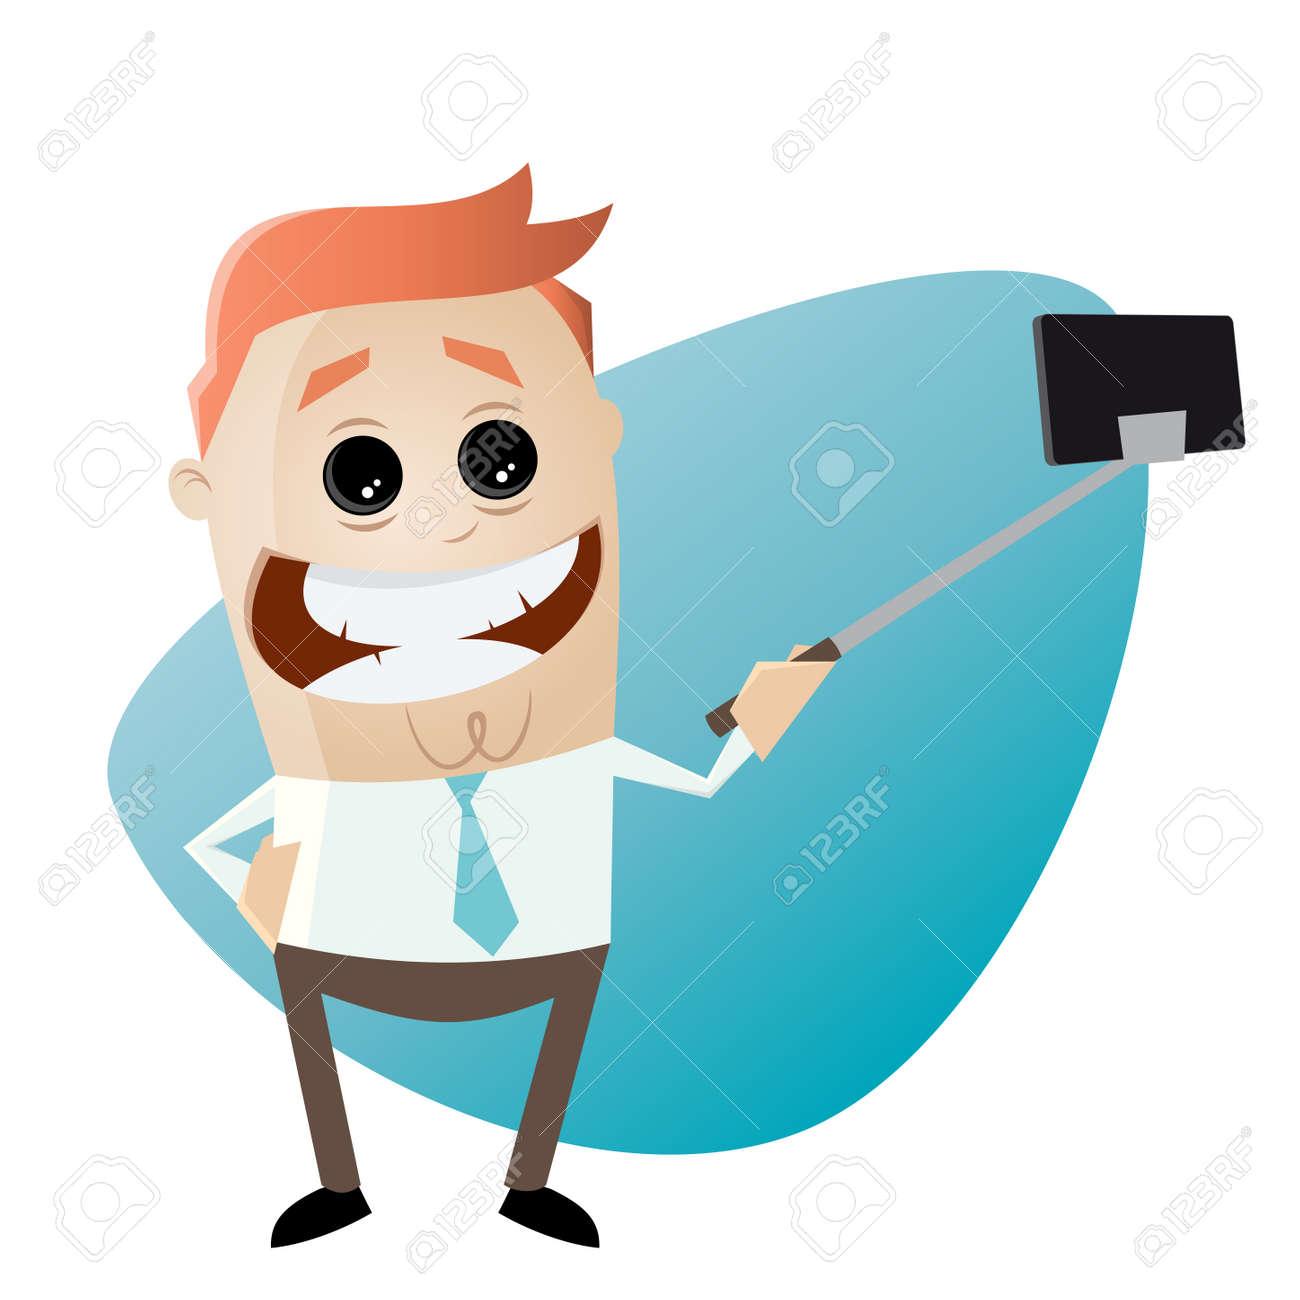 taking selfie clipart royalty free cliparts vectors and stock rh 123rf com selfie stick clipart selfie clipart